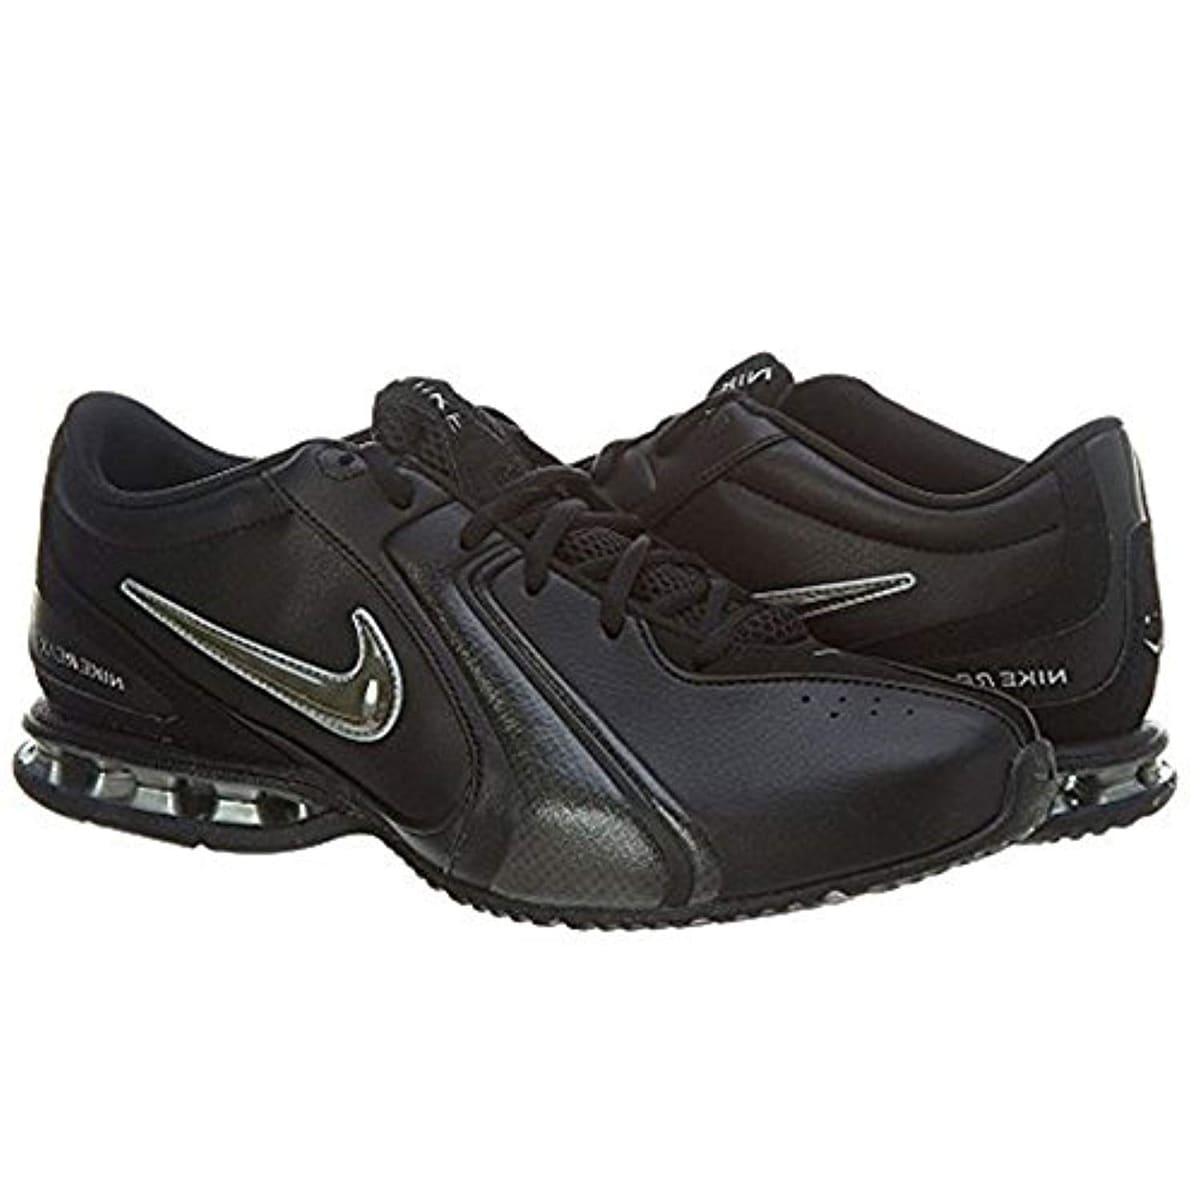 Shop Nike Men's Reax Trainer III